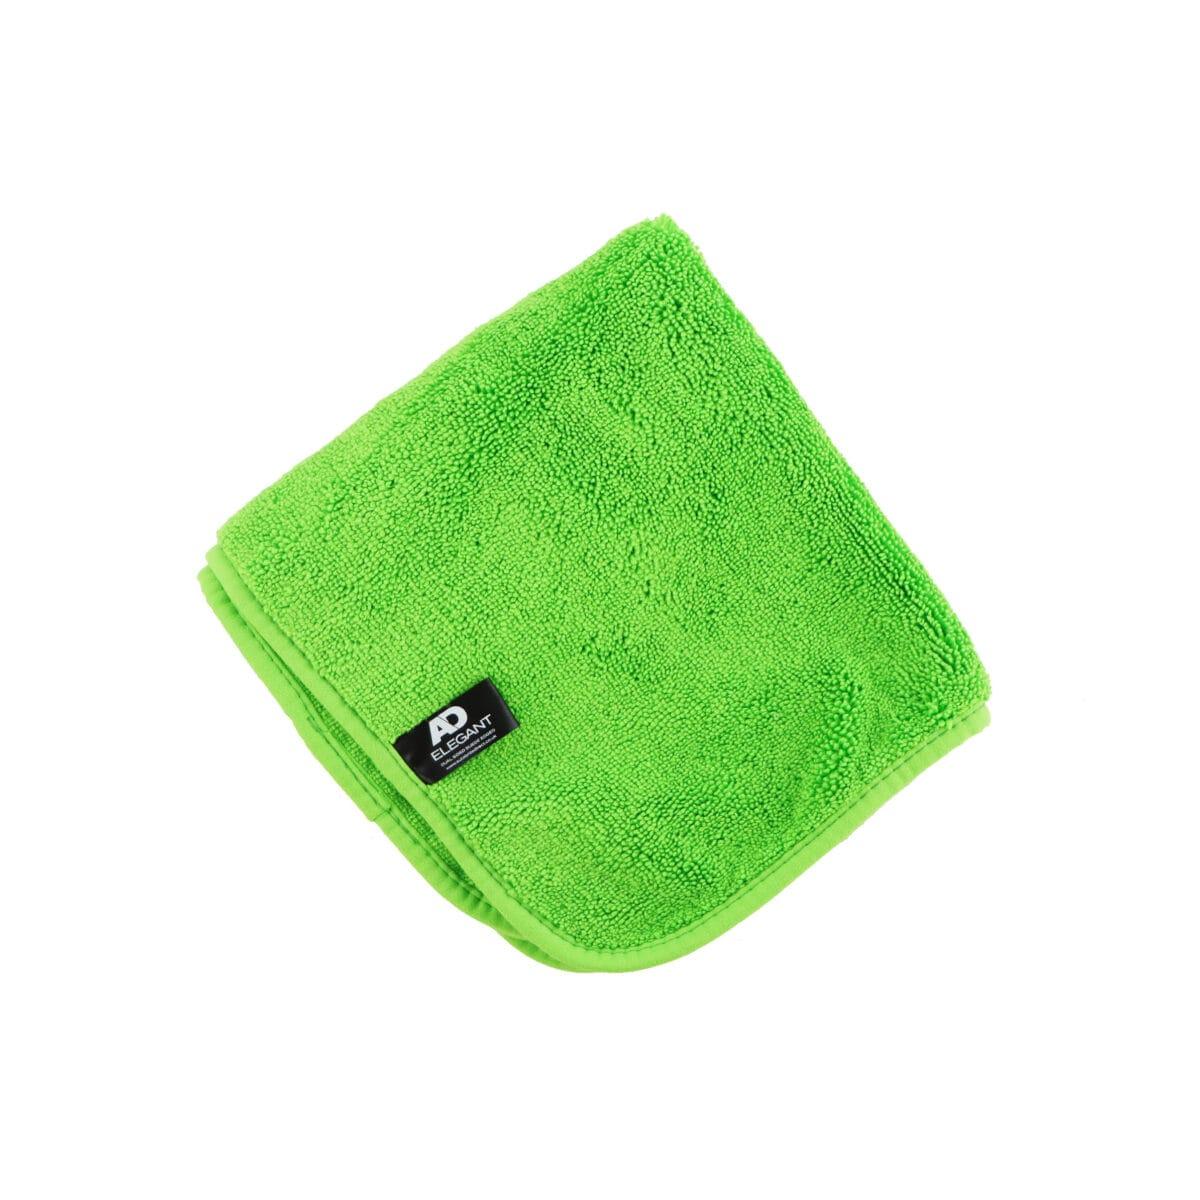 Elegant buffing towel